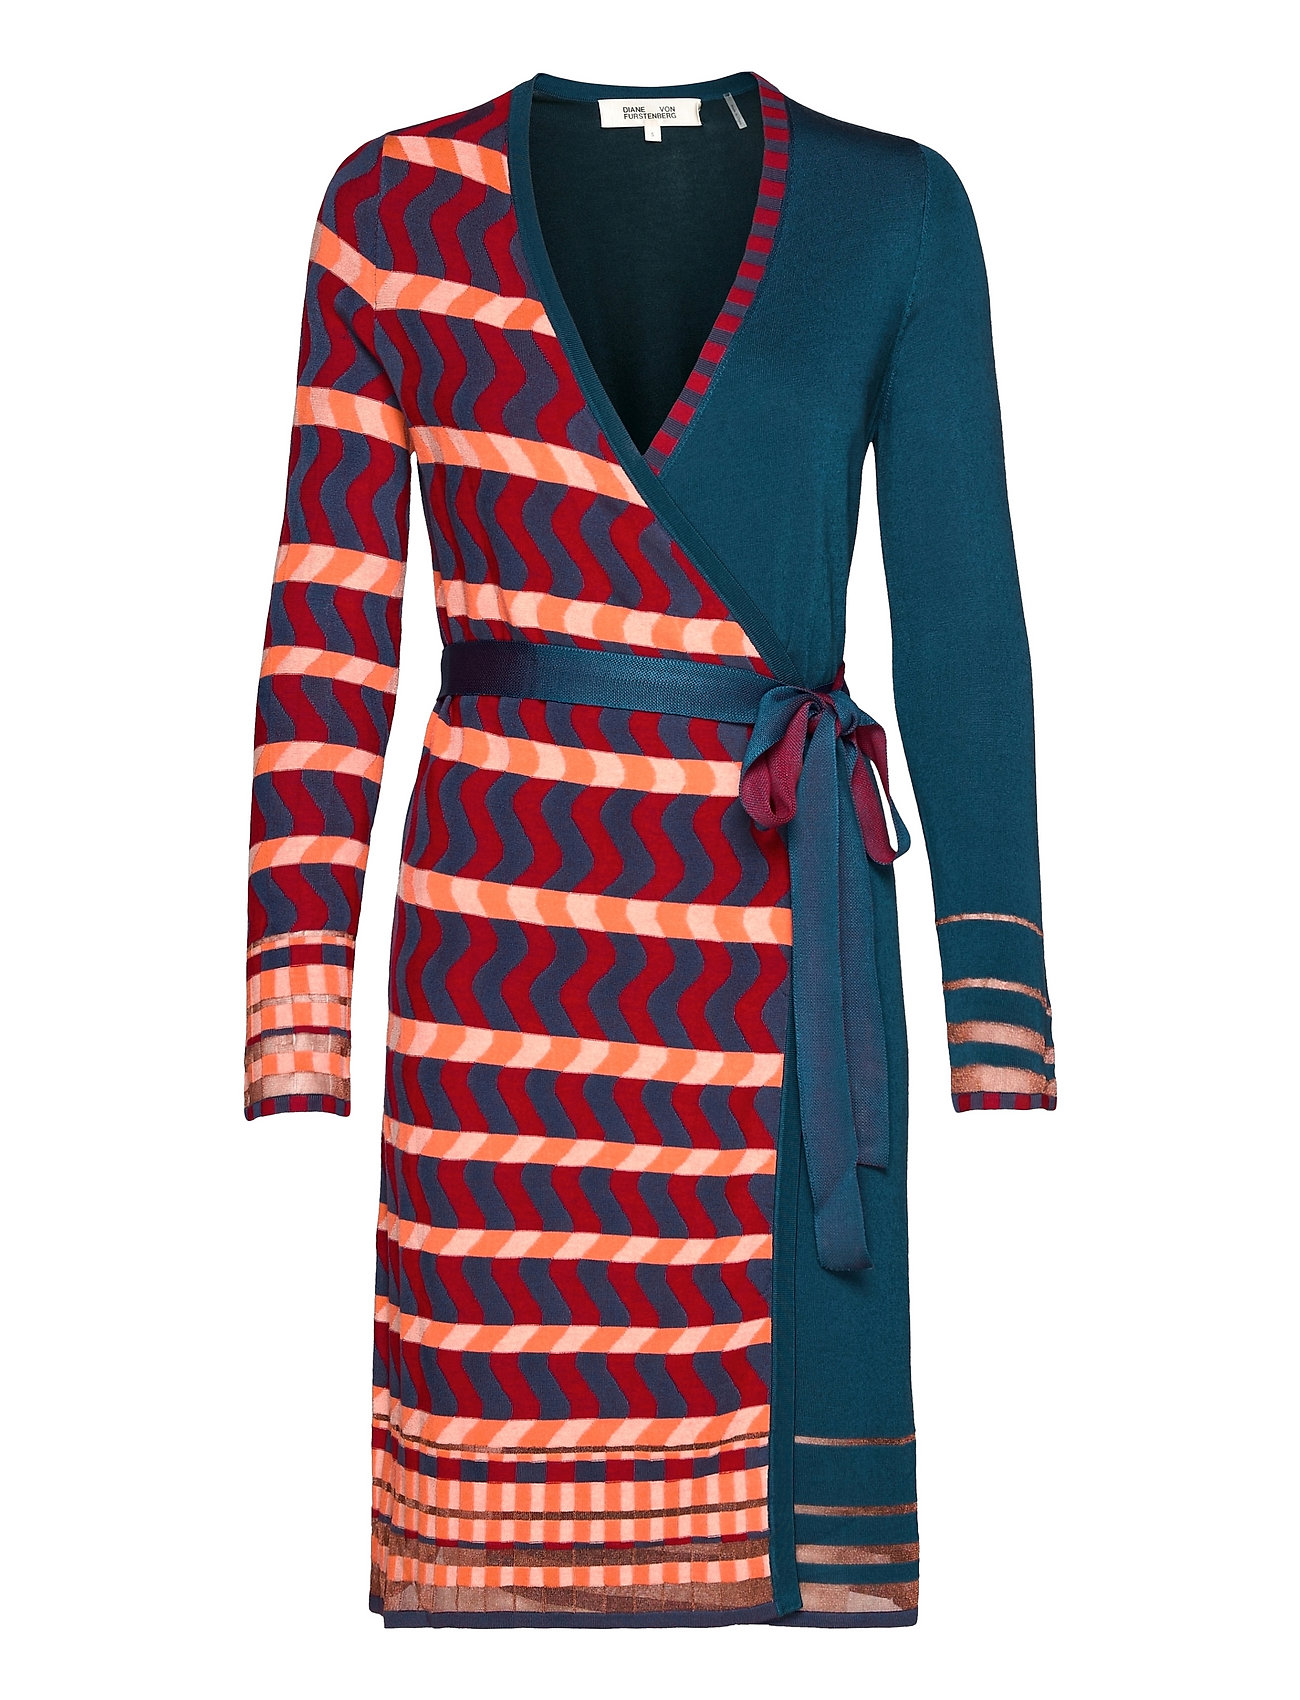 Dvf Ariana Dress Knælang Kjole Multi/mønstret Diane Von Furstenberg